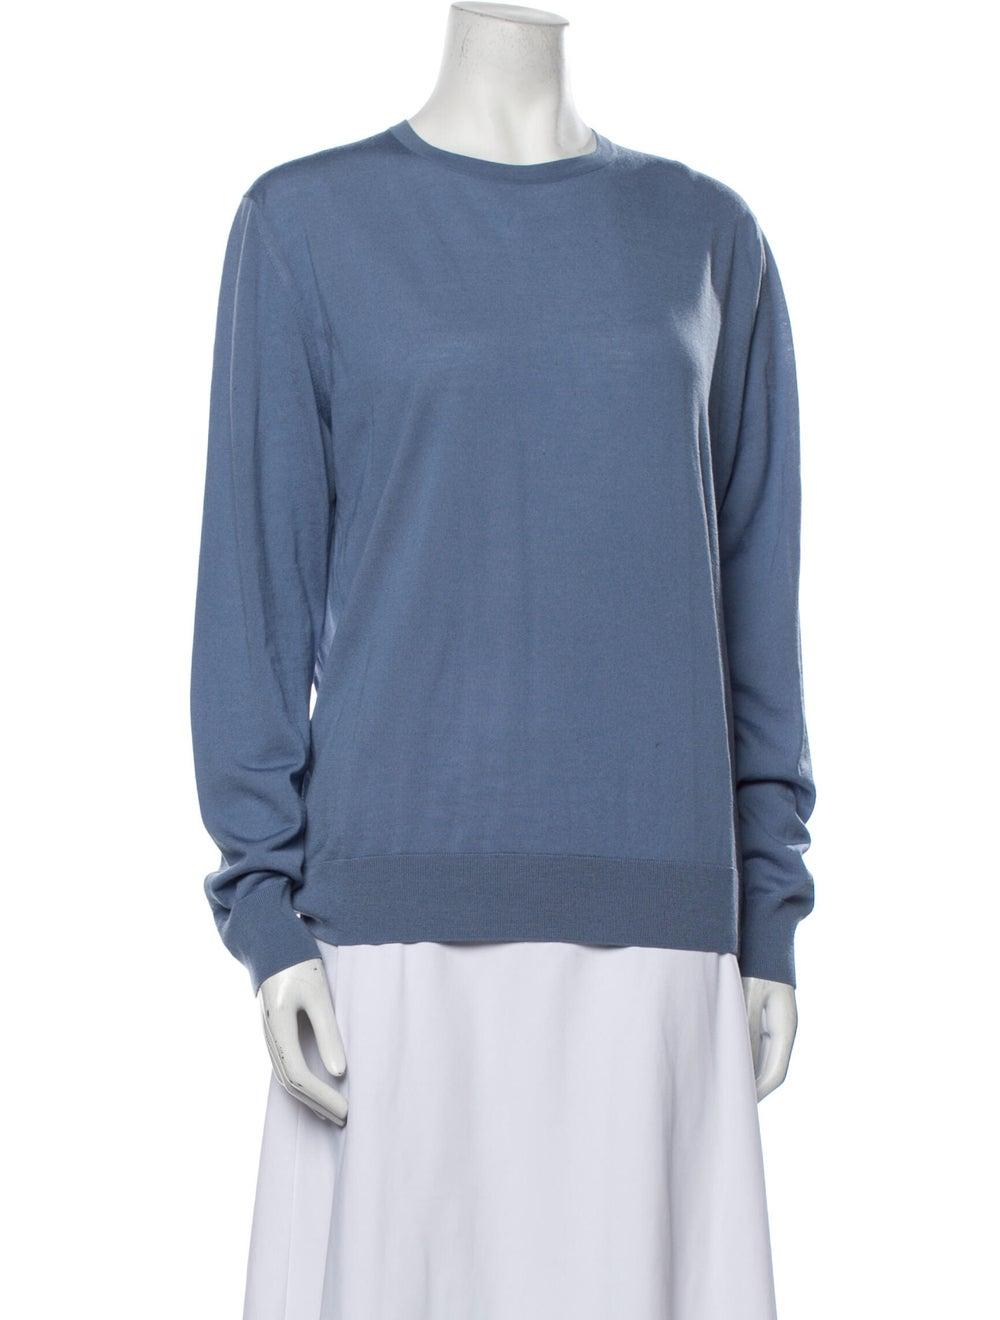 Prada Virgin Wool Crew Neck Sweater Wool - image 1